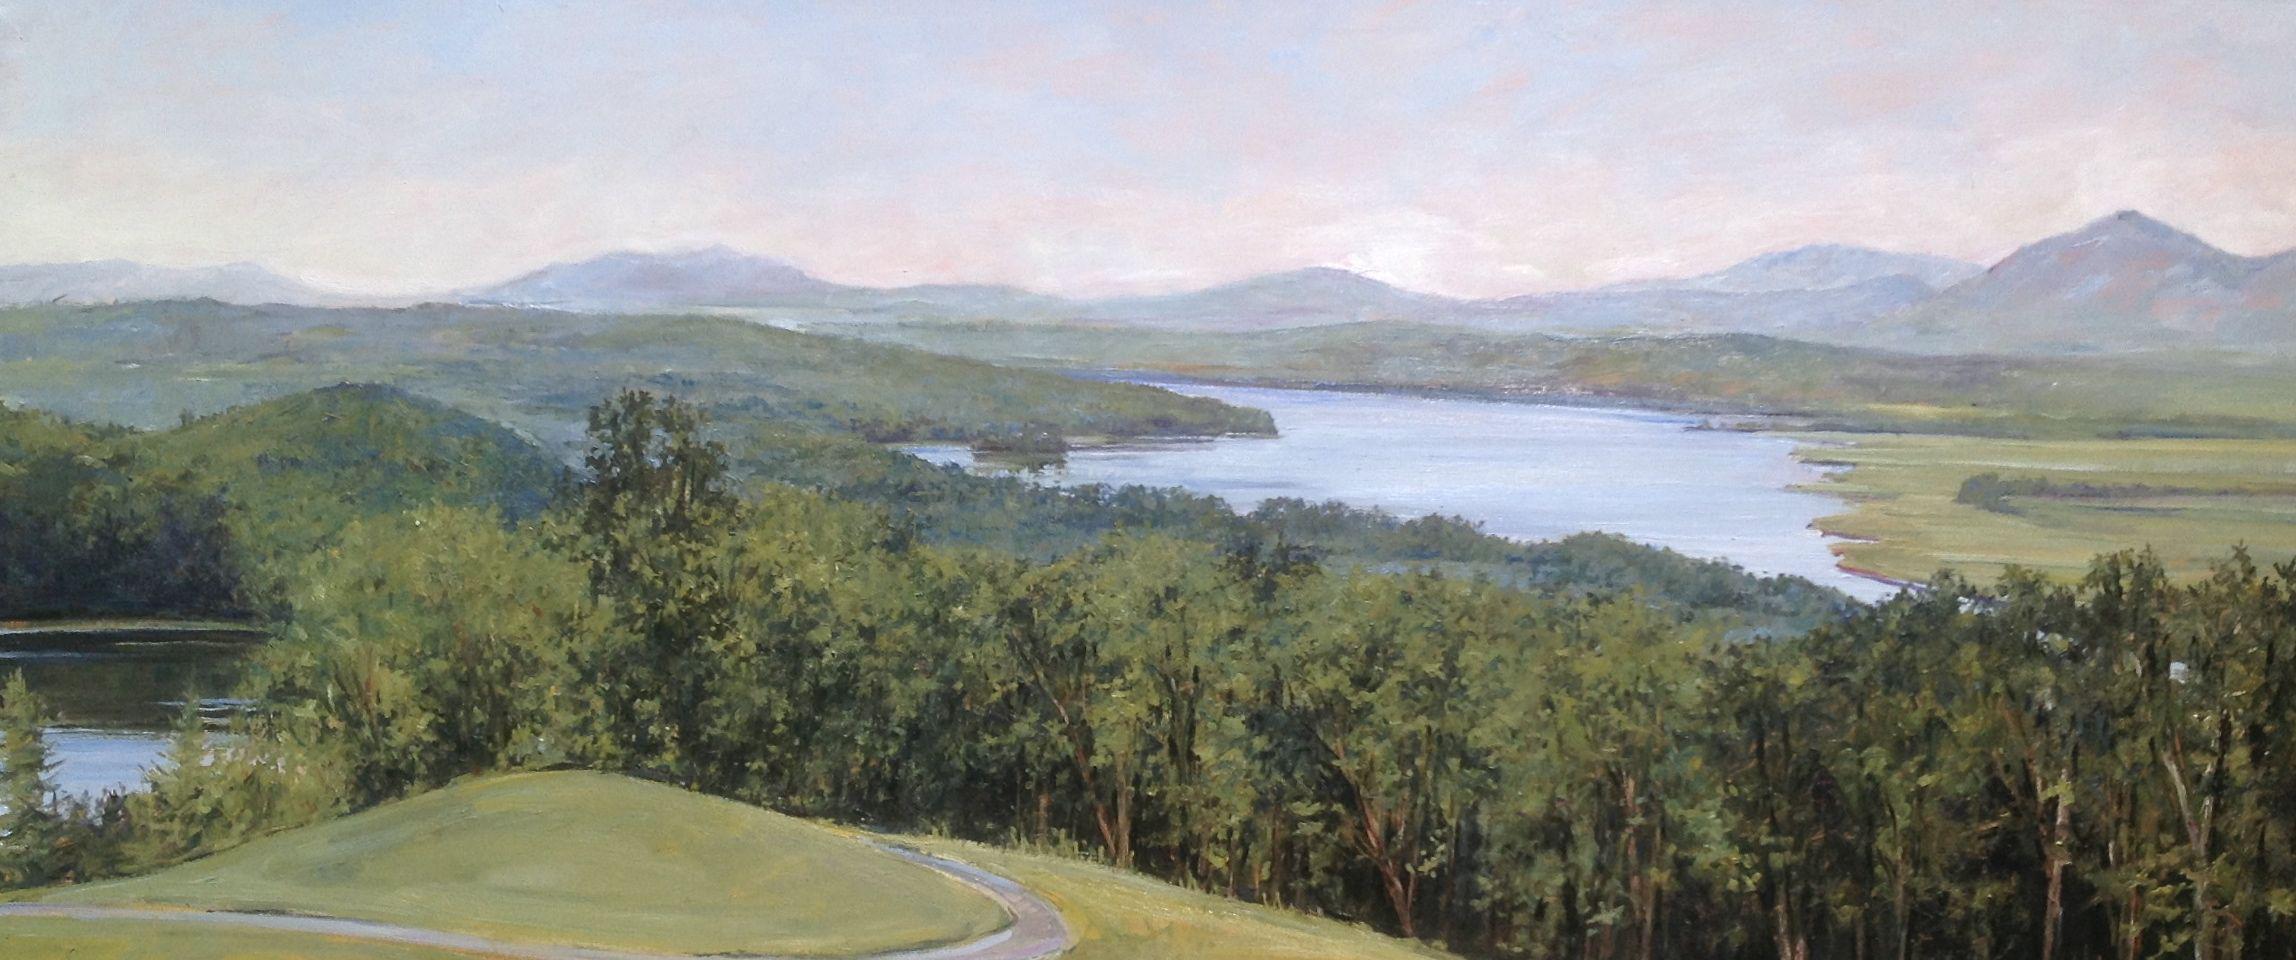 EMILY BUCHANAN  Olana   Oil on panel 18 x 42 inches (45.7 x 106.7)   SOLD